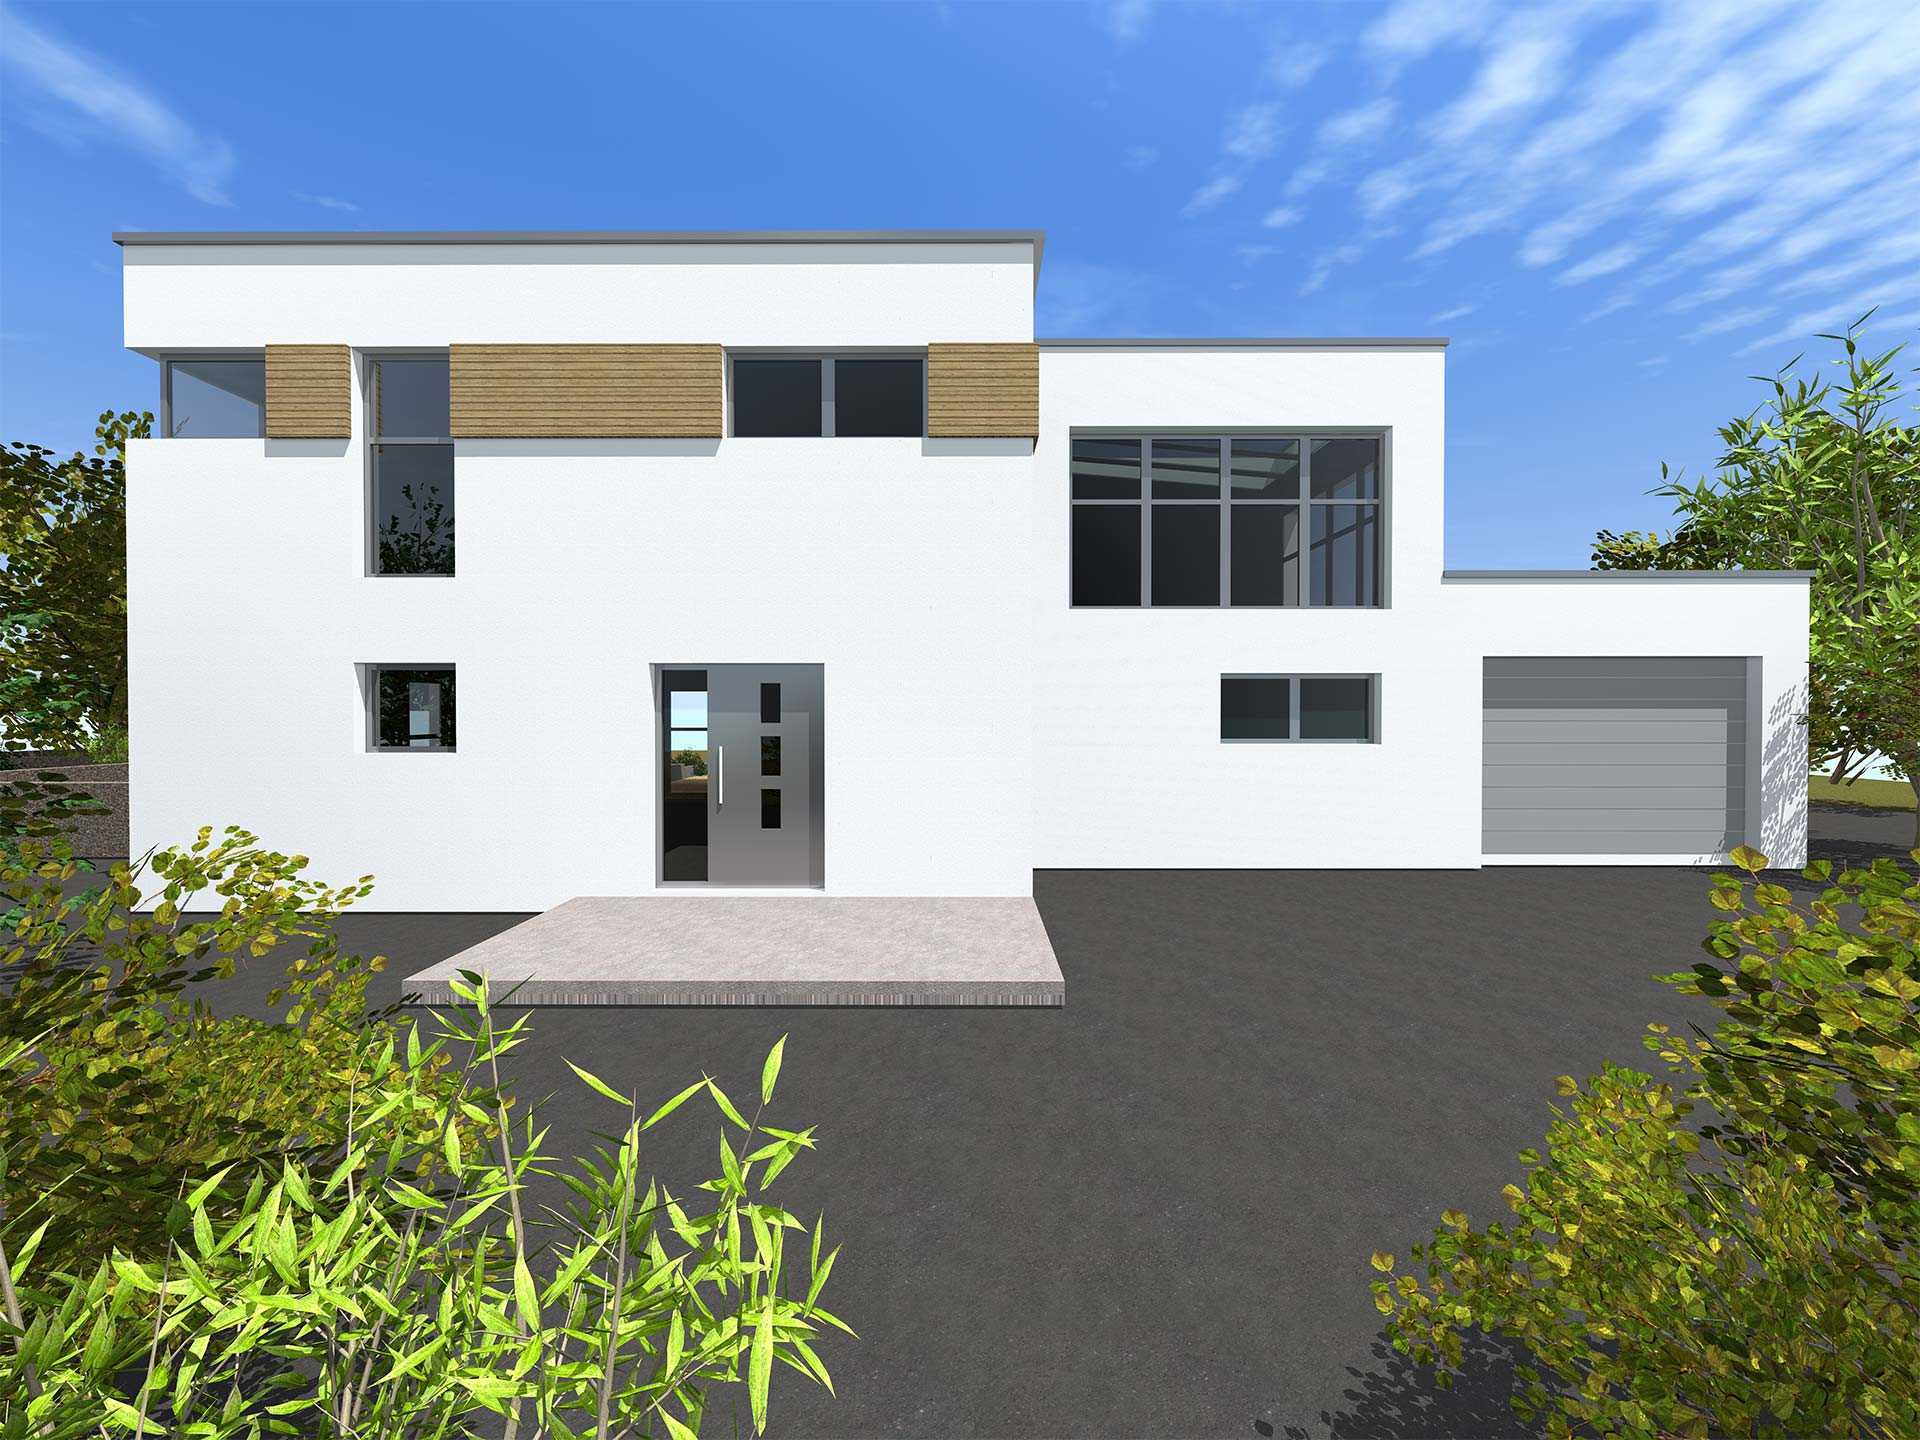 Kubus haus comfort 300 gecci for Comfort house